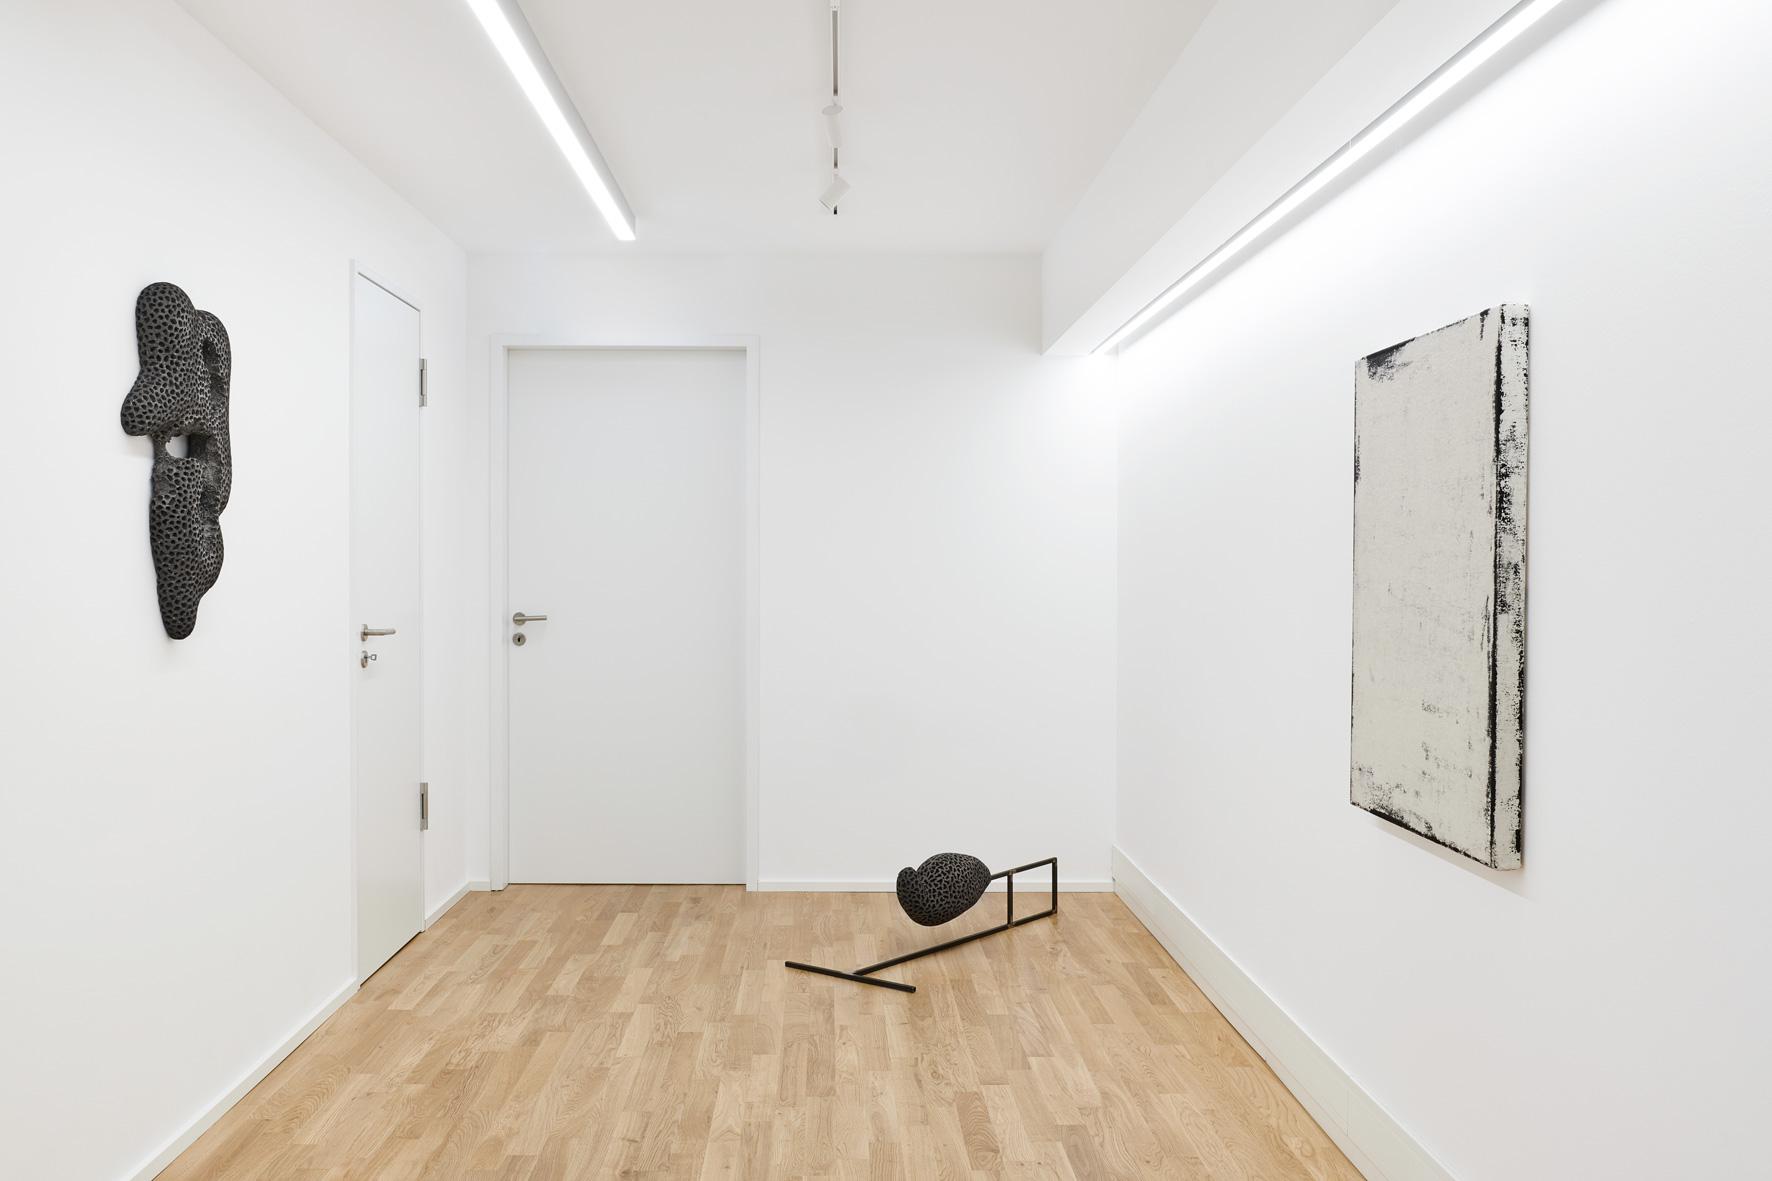 2019.01.08_Galerie-Alber-30.web.jpg